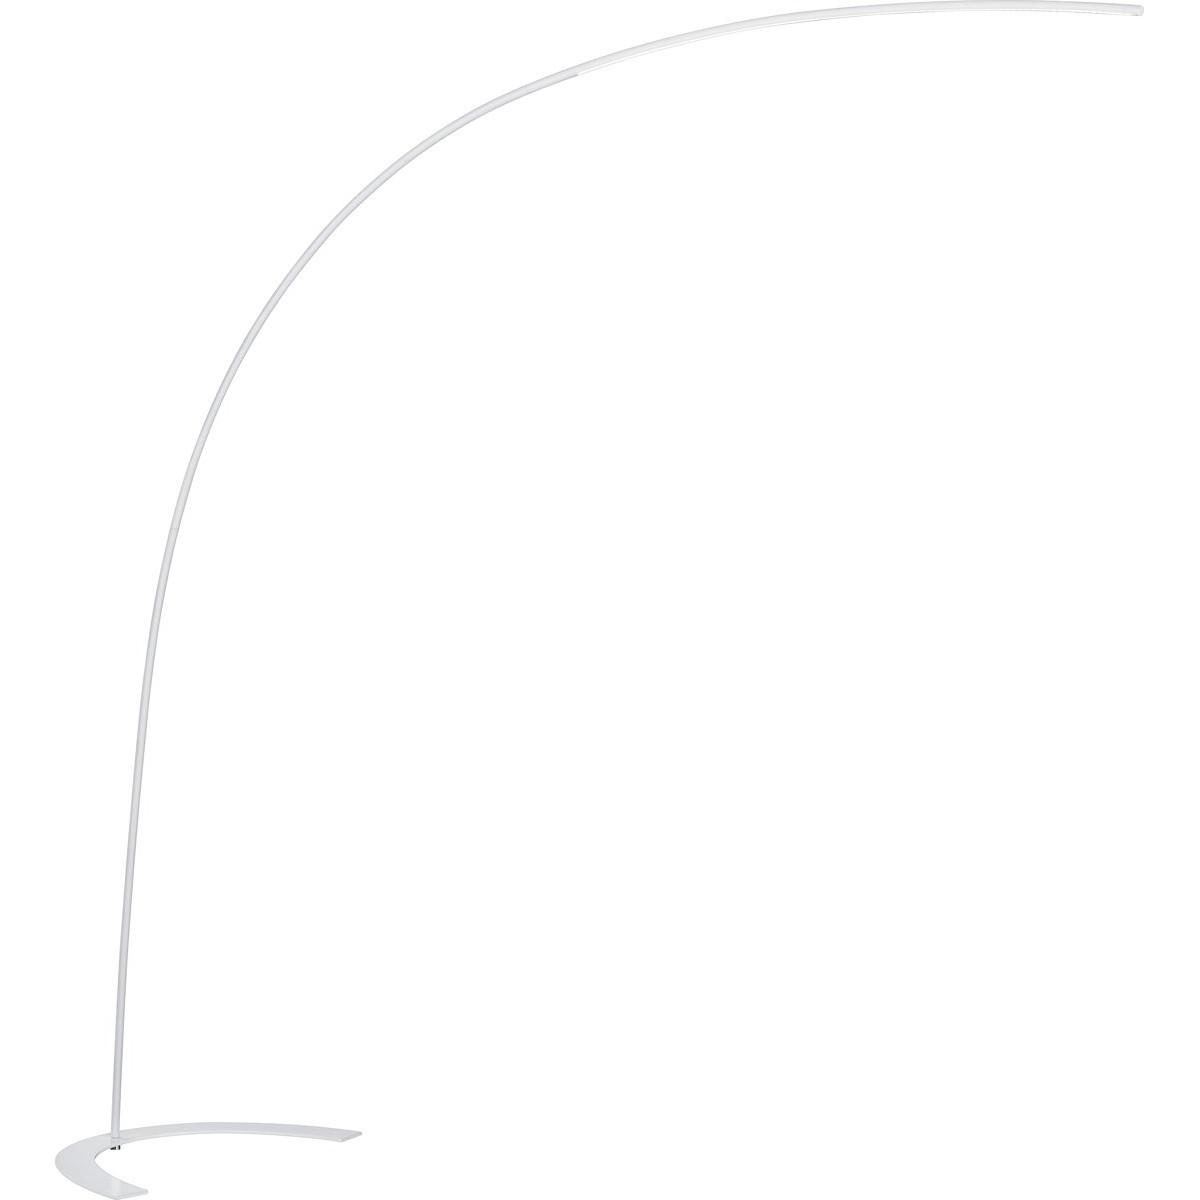 LED Vloerlamp - Trion Shio - 18W - Warm Wit 3000K - 1-lichts - Dimbaar - Rond - Mat Wit - Aluminium